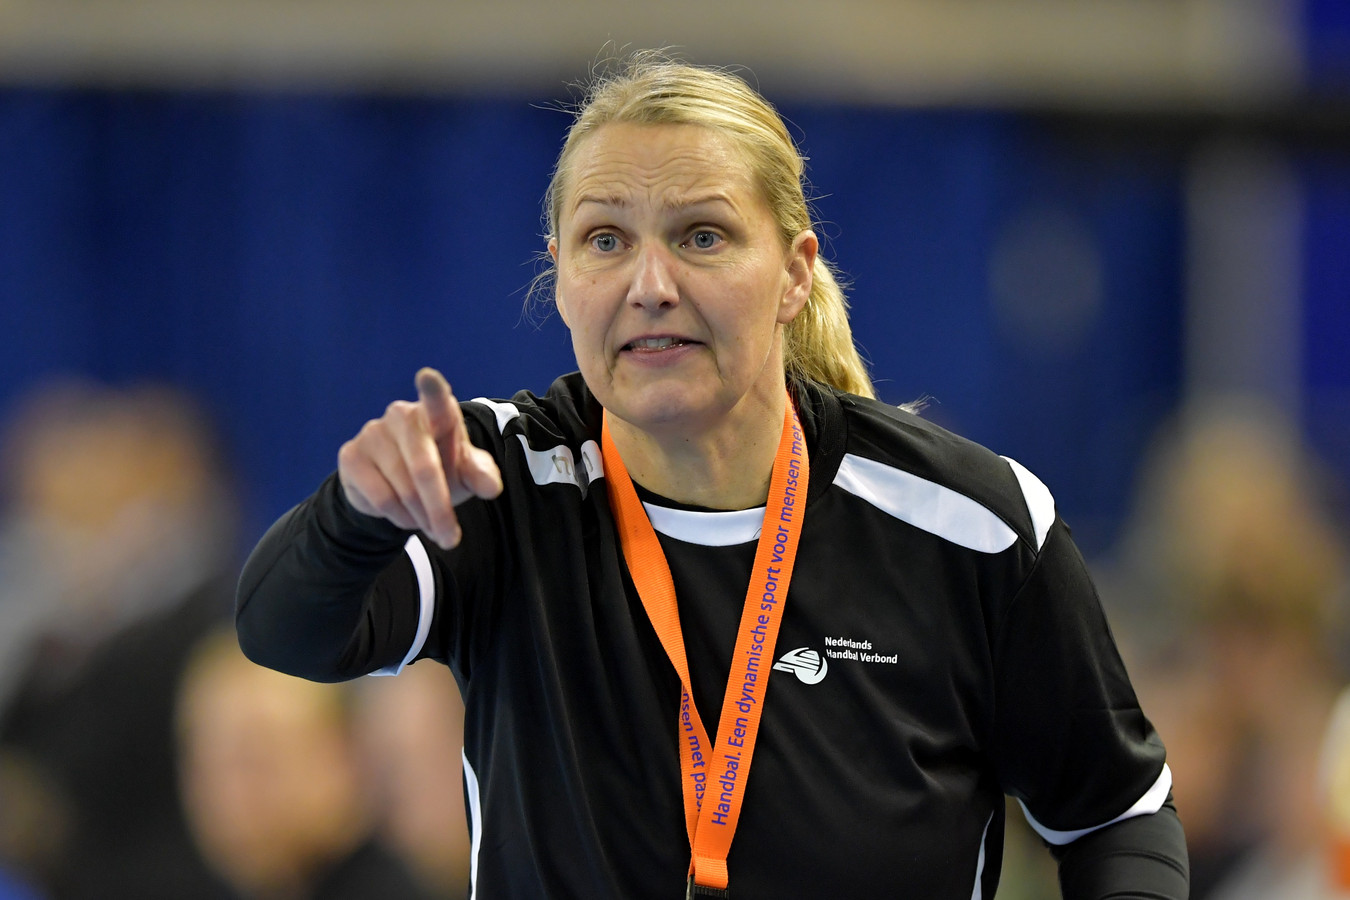 Helle Thomsen.